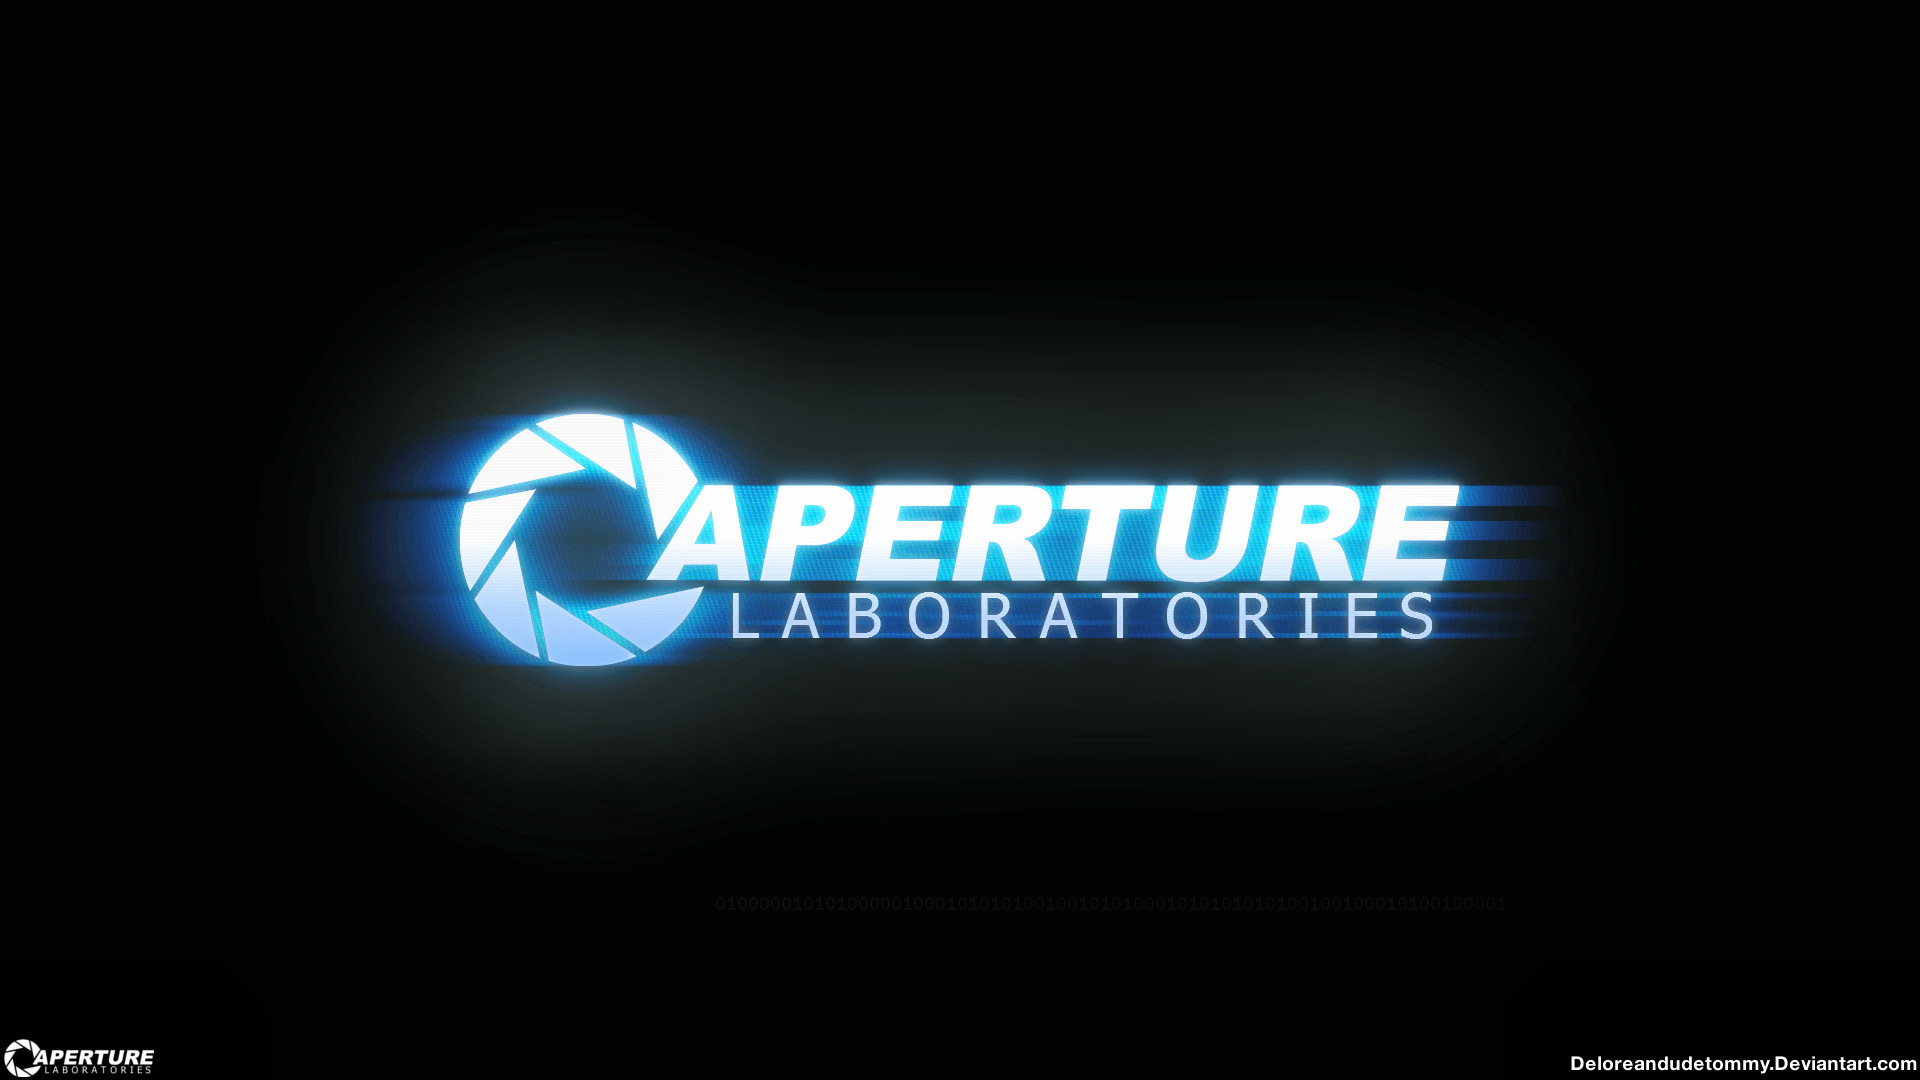 Aperture Science Wallpaper Hd Backgrounds 10 Cool Hd   Wallpaperiz.